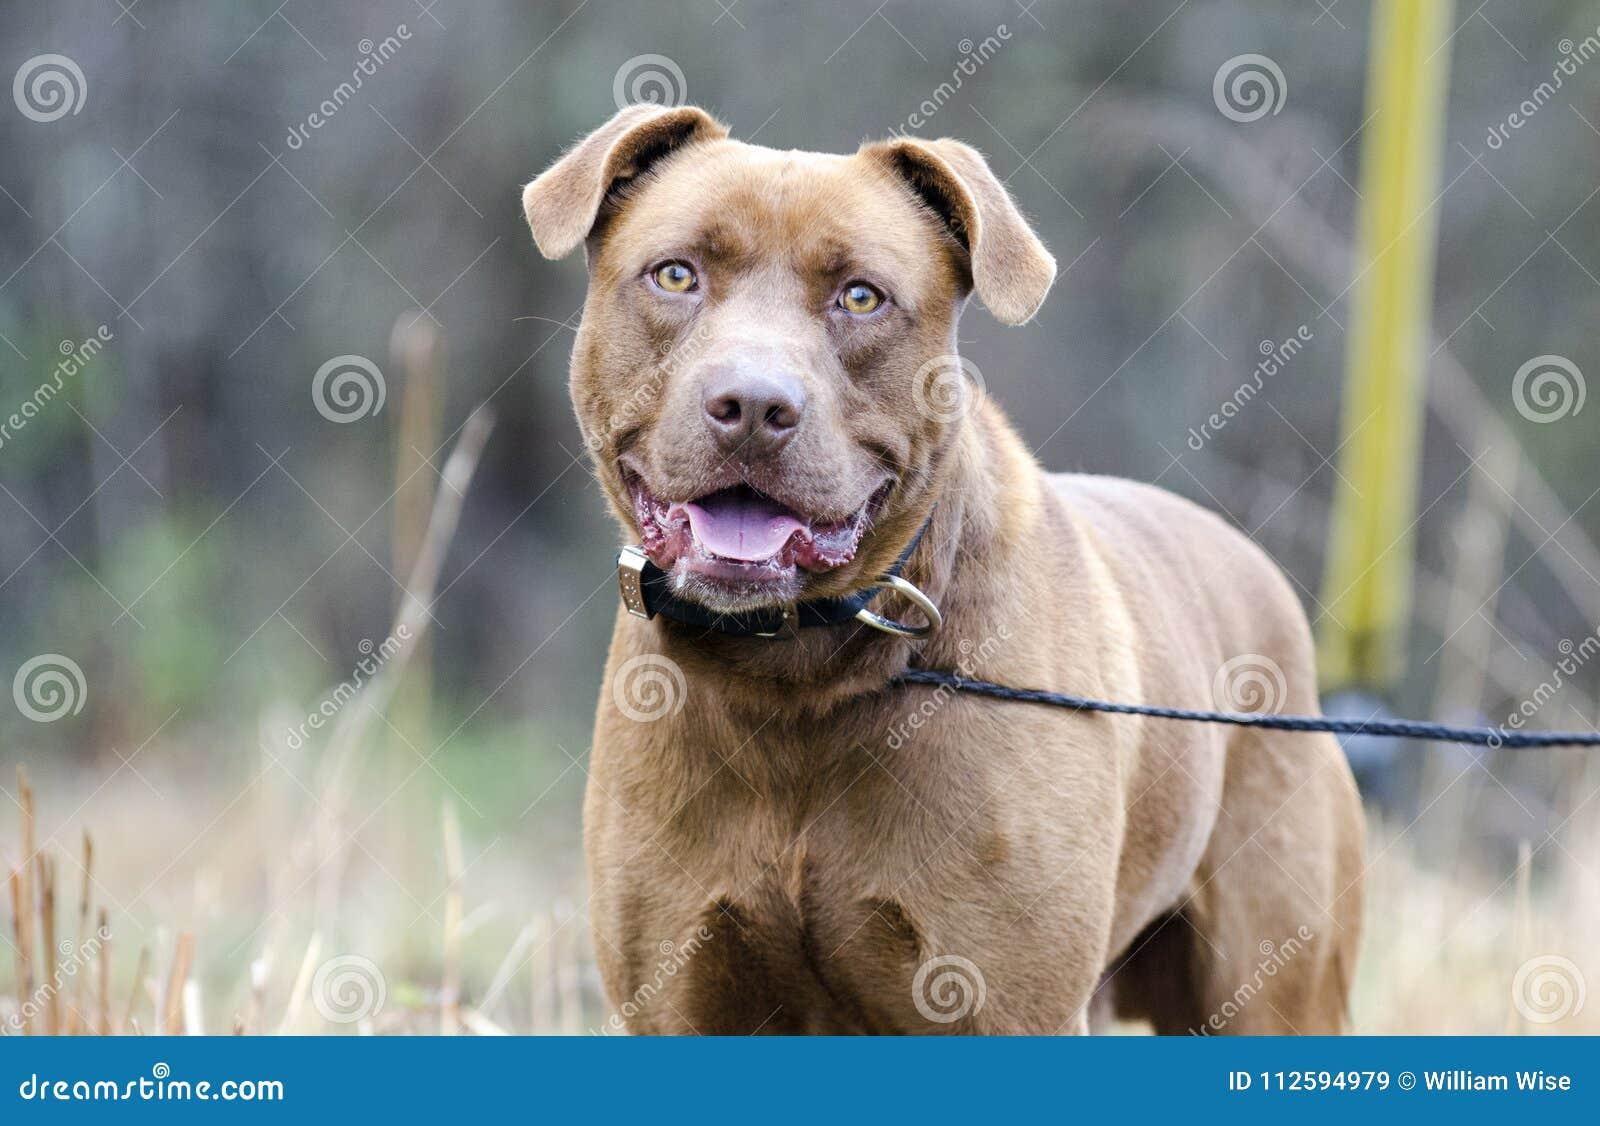 Chocolate Labrador Pitbull Mixed Breed Dog Stock Image Image Of